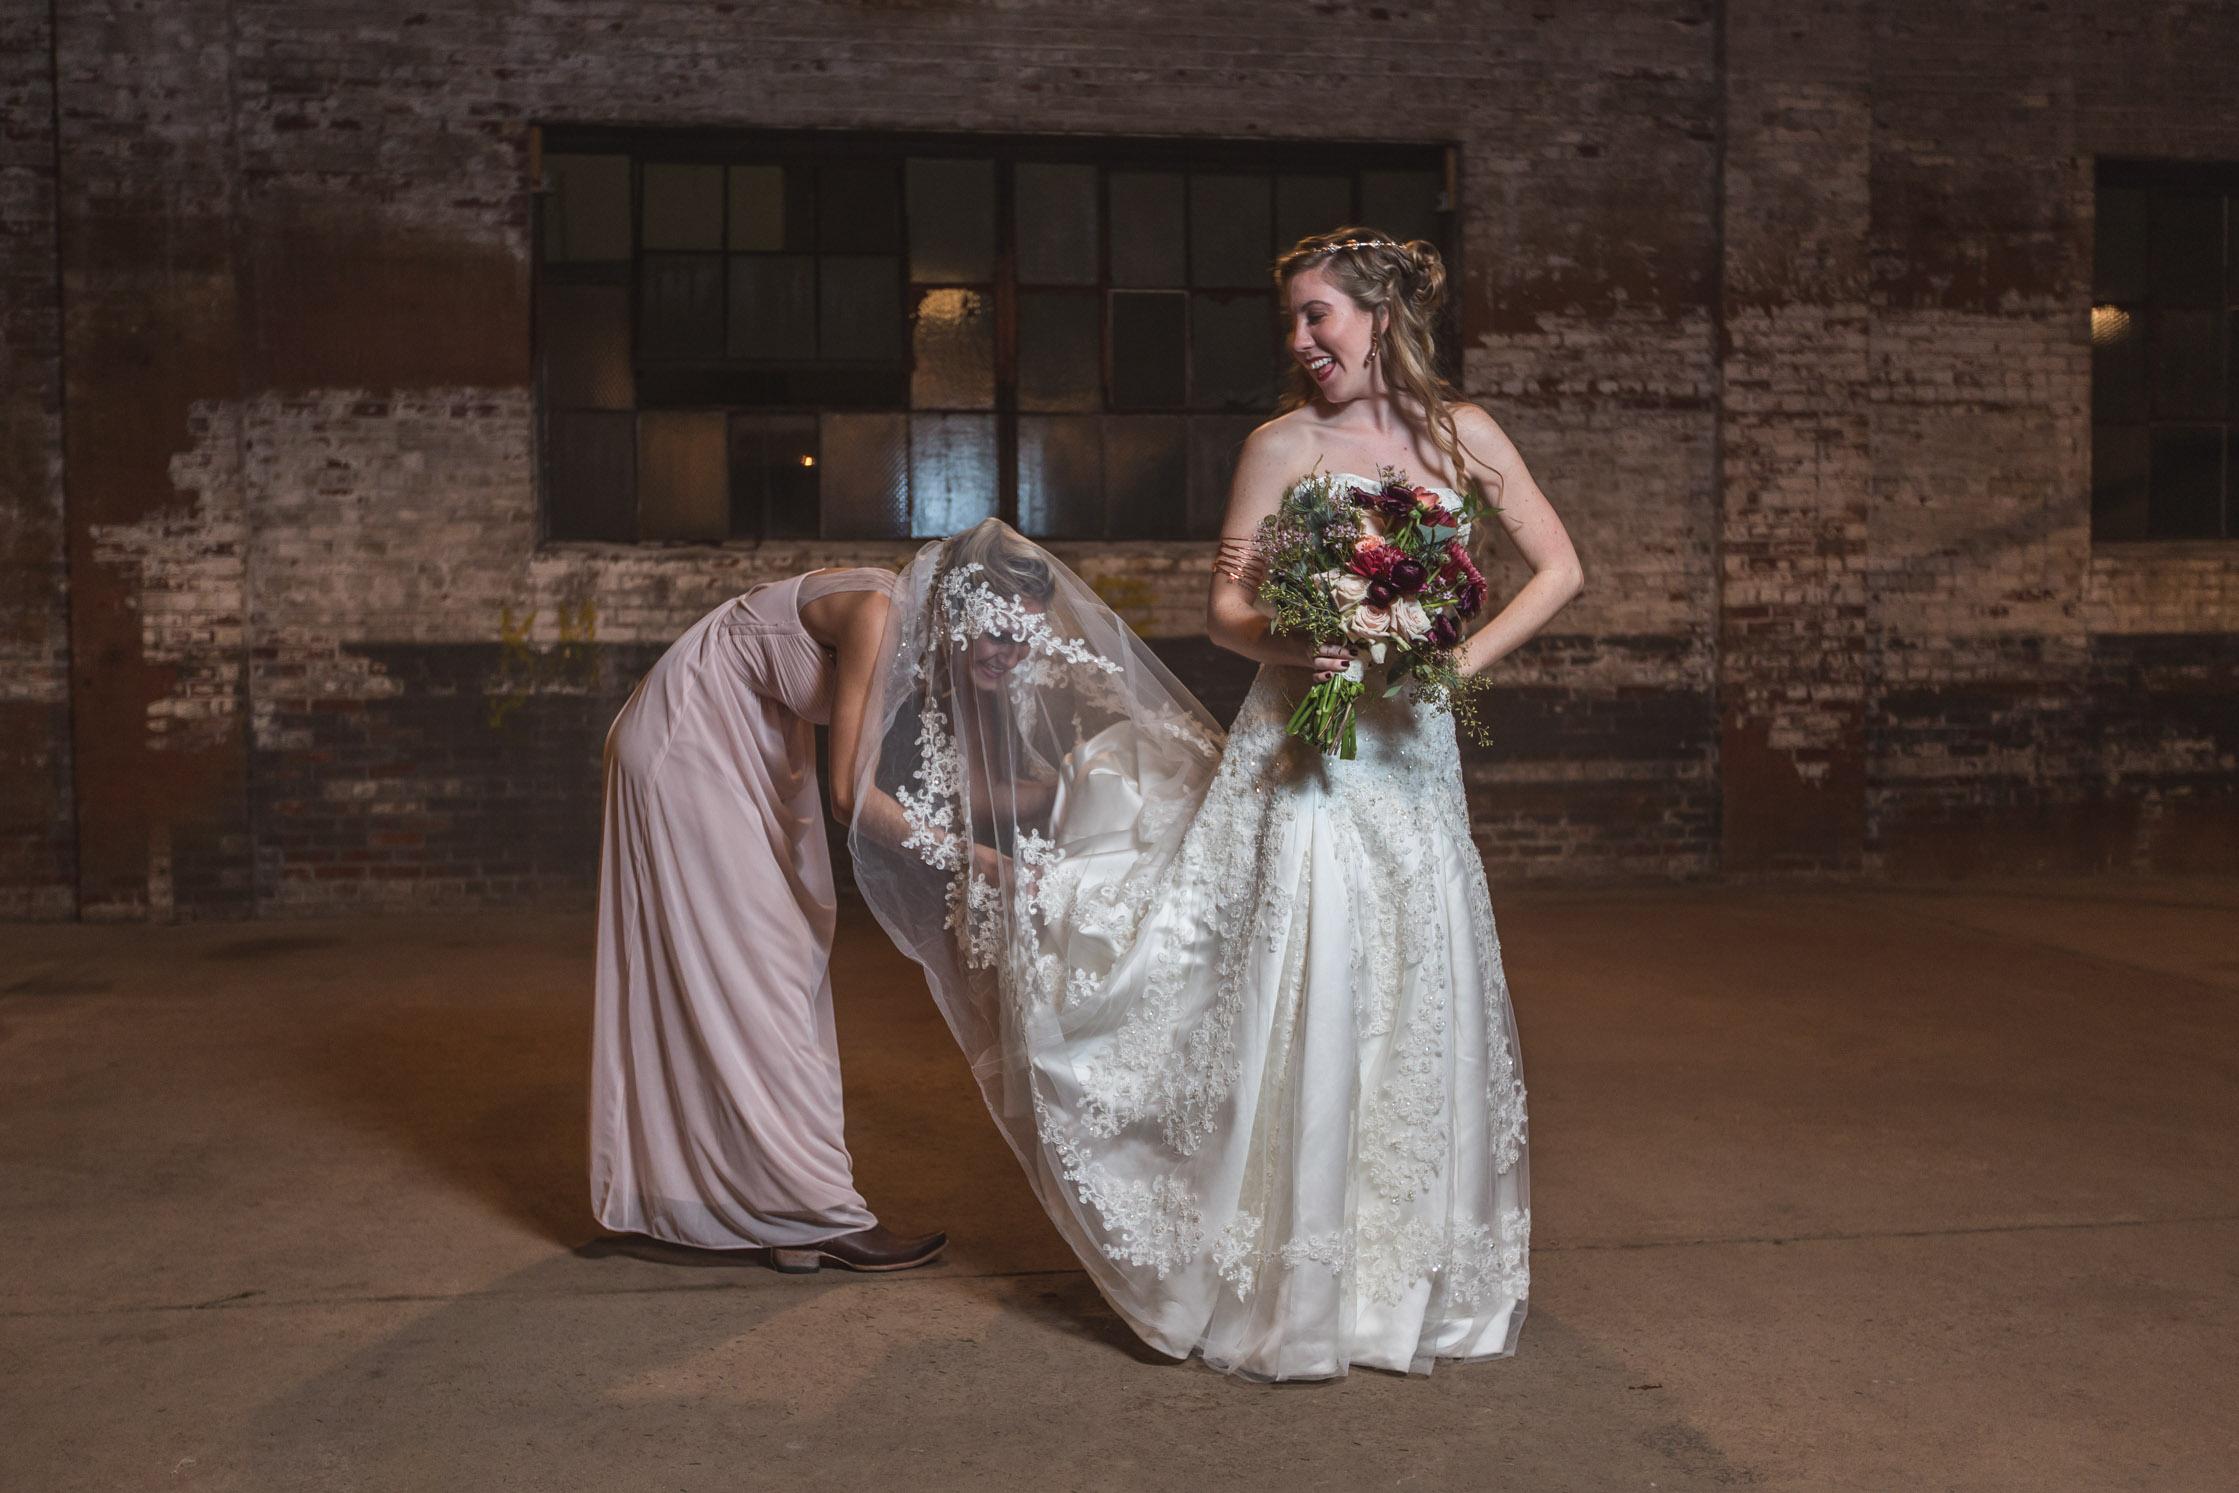 Adam-Szrmack-The-Glass-Factory-Wedding-121.jpg